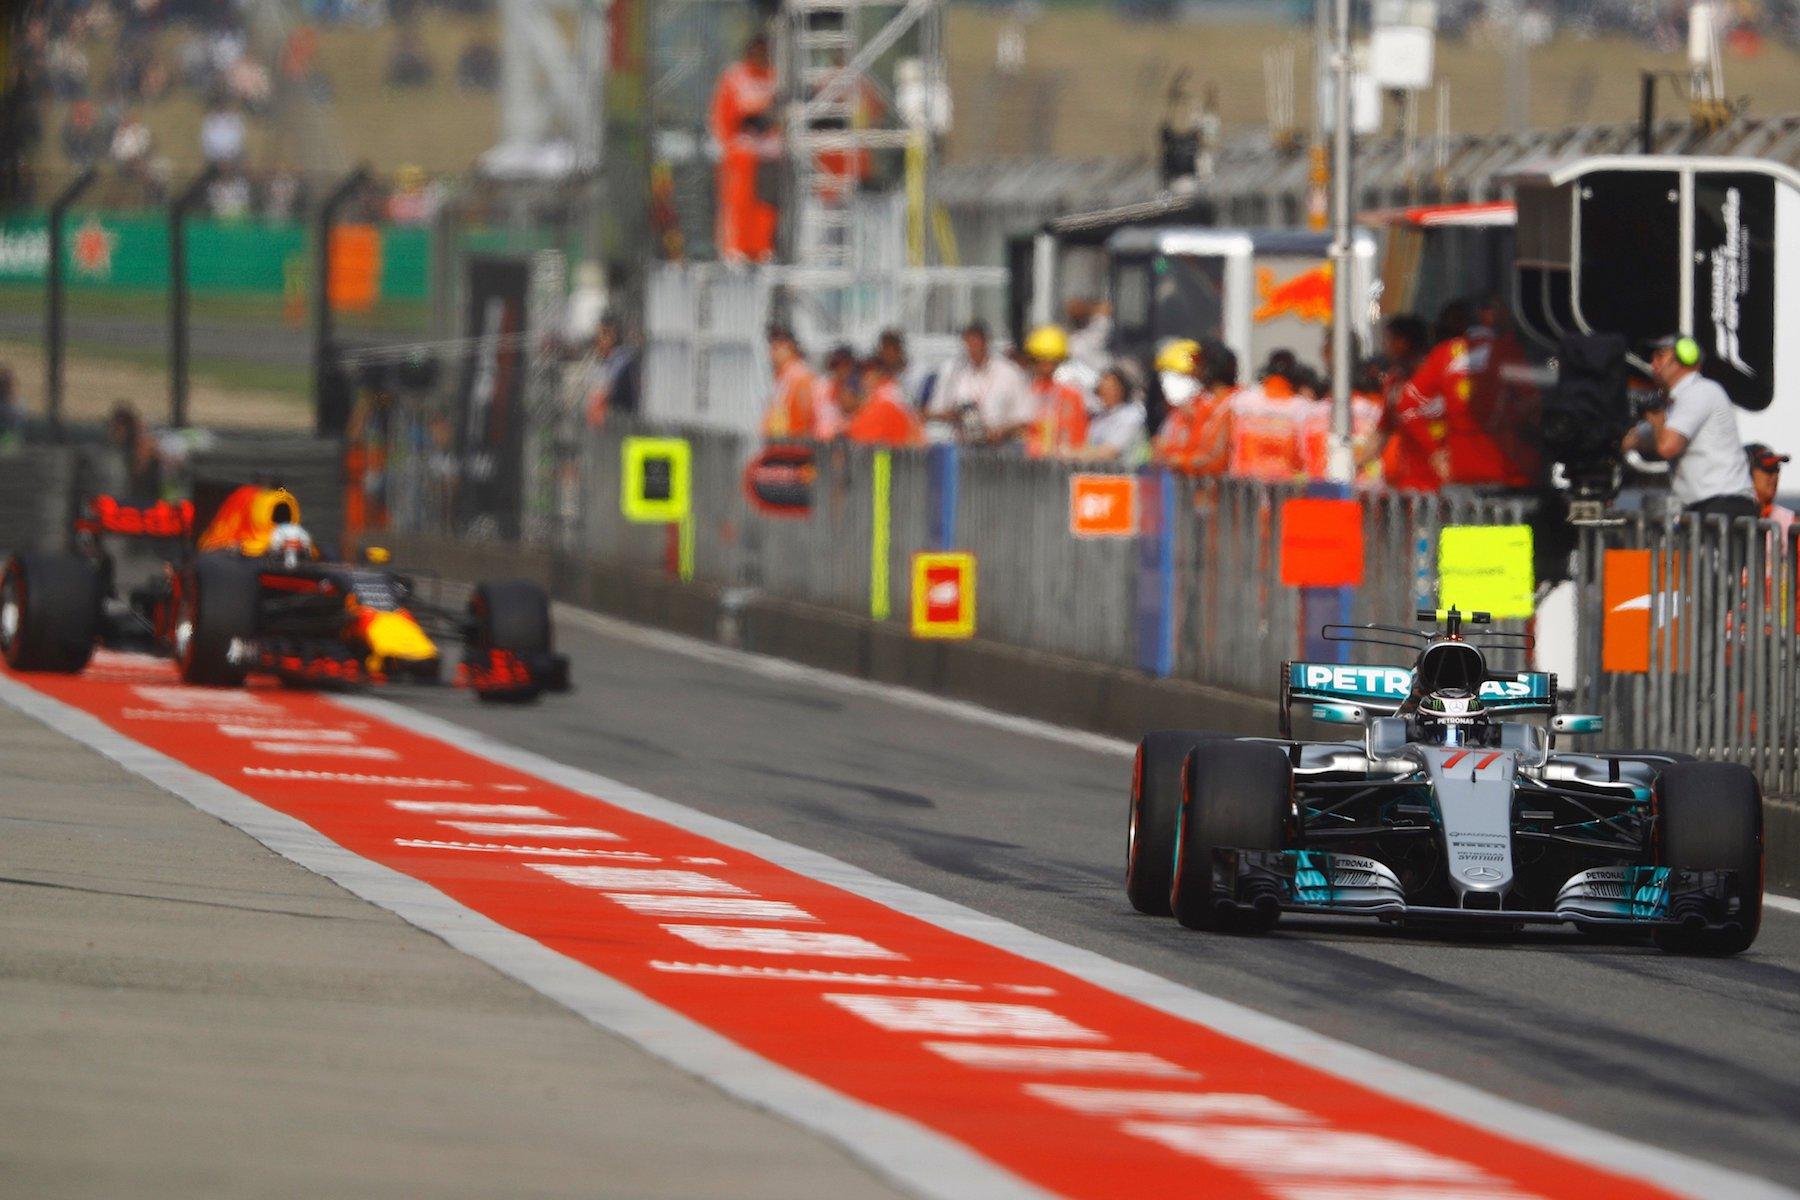 2017 Valtteri Bottas | Mercedes W08 | 2017 Chinese GP Q3 1 copy.jpg